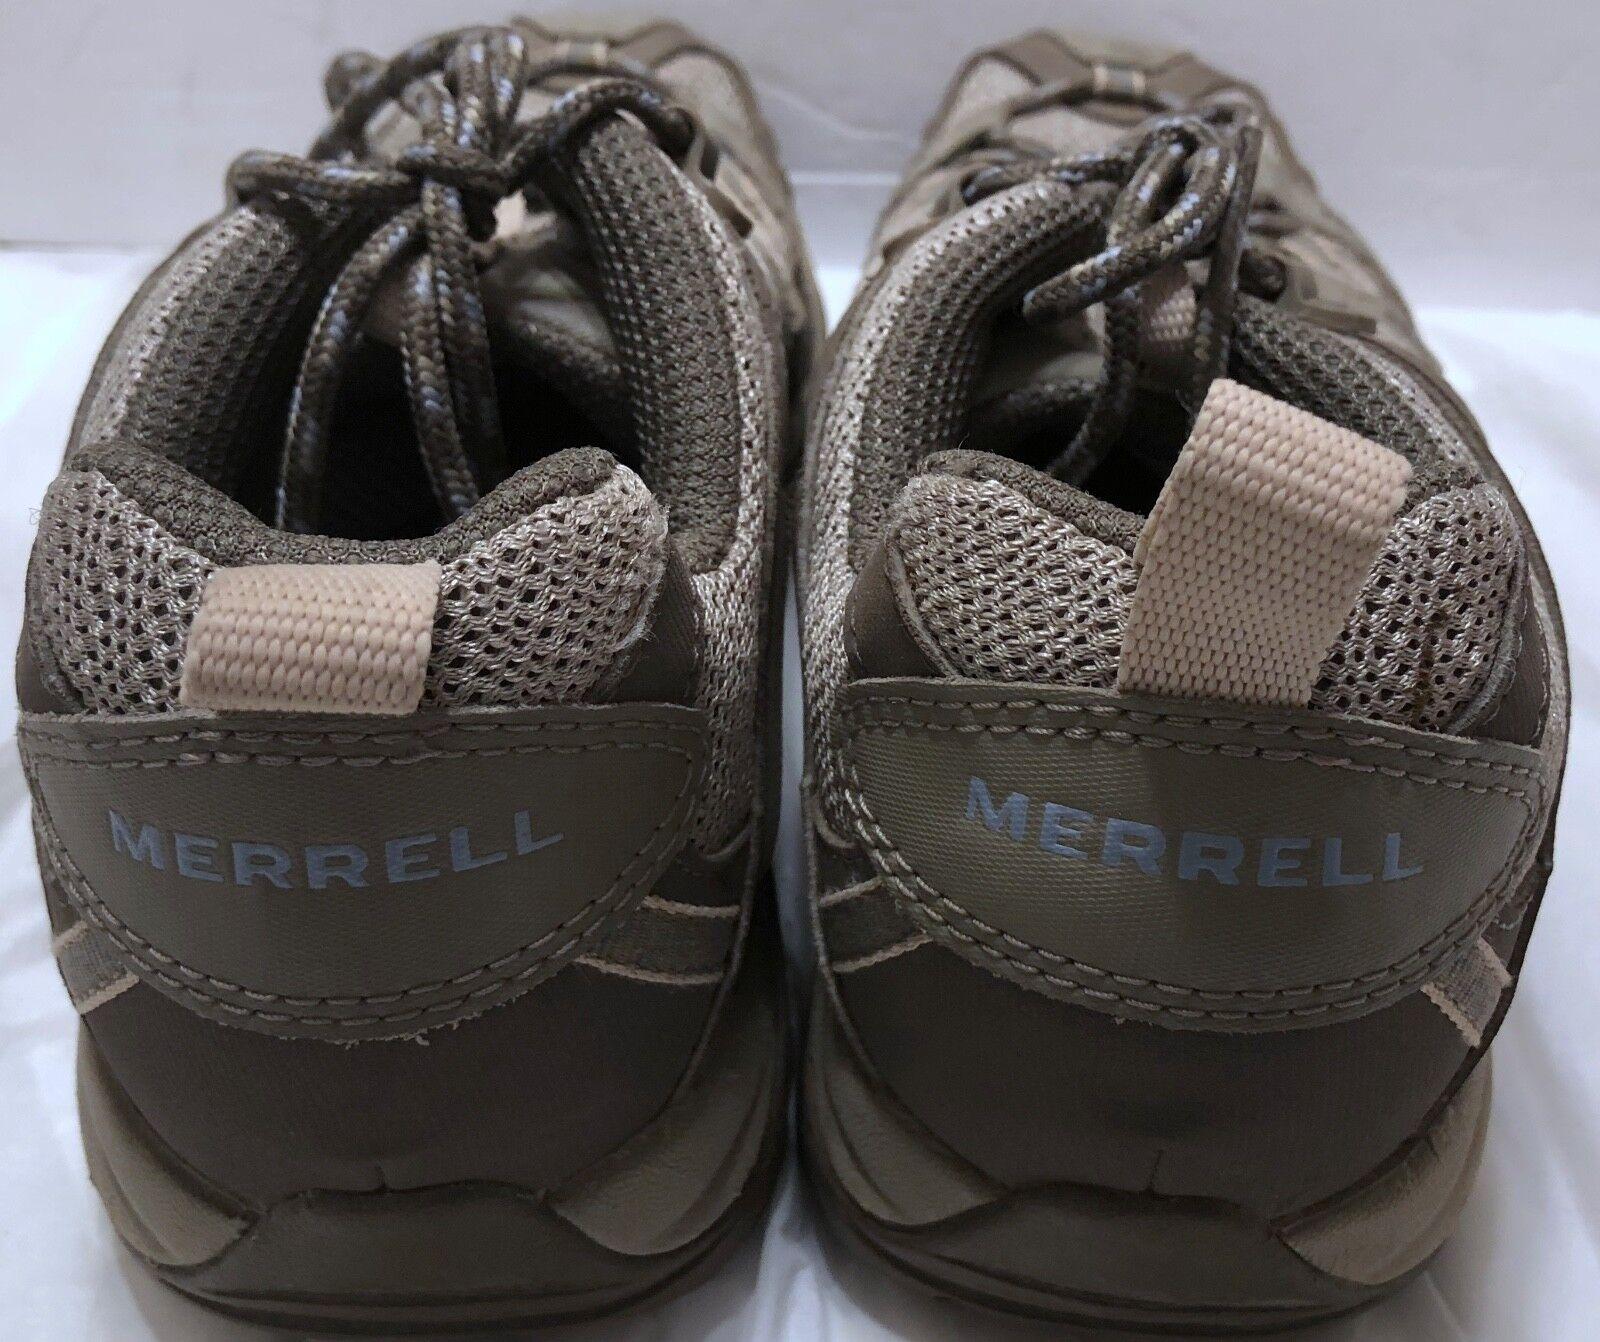 Merrell Olive Braun Blau Hiking Schuhes Größe 7.5 Vibram Soles Trail Hike Outdoors